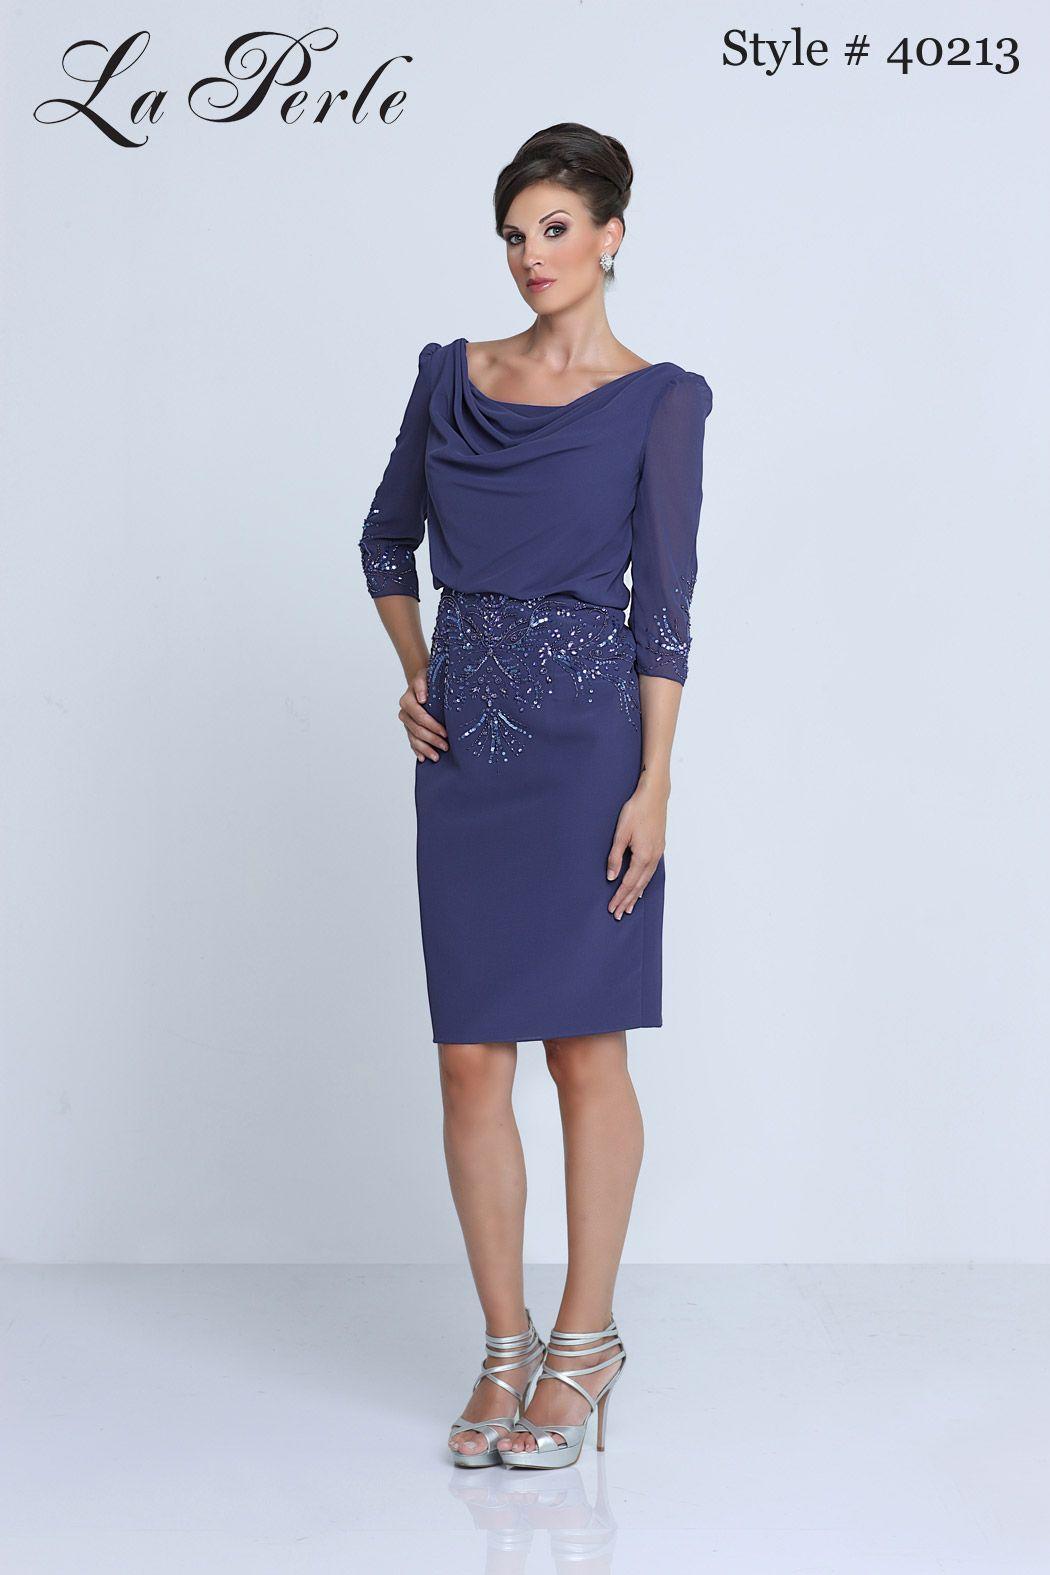 La Perle style # 40213 ~ blue chiffon knee length dress with cowl ...